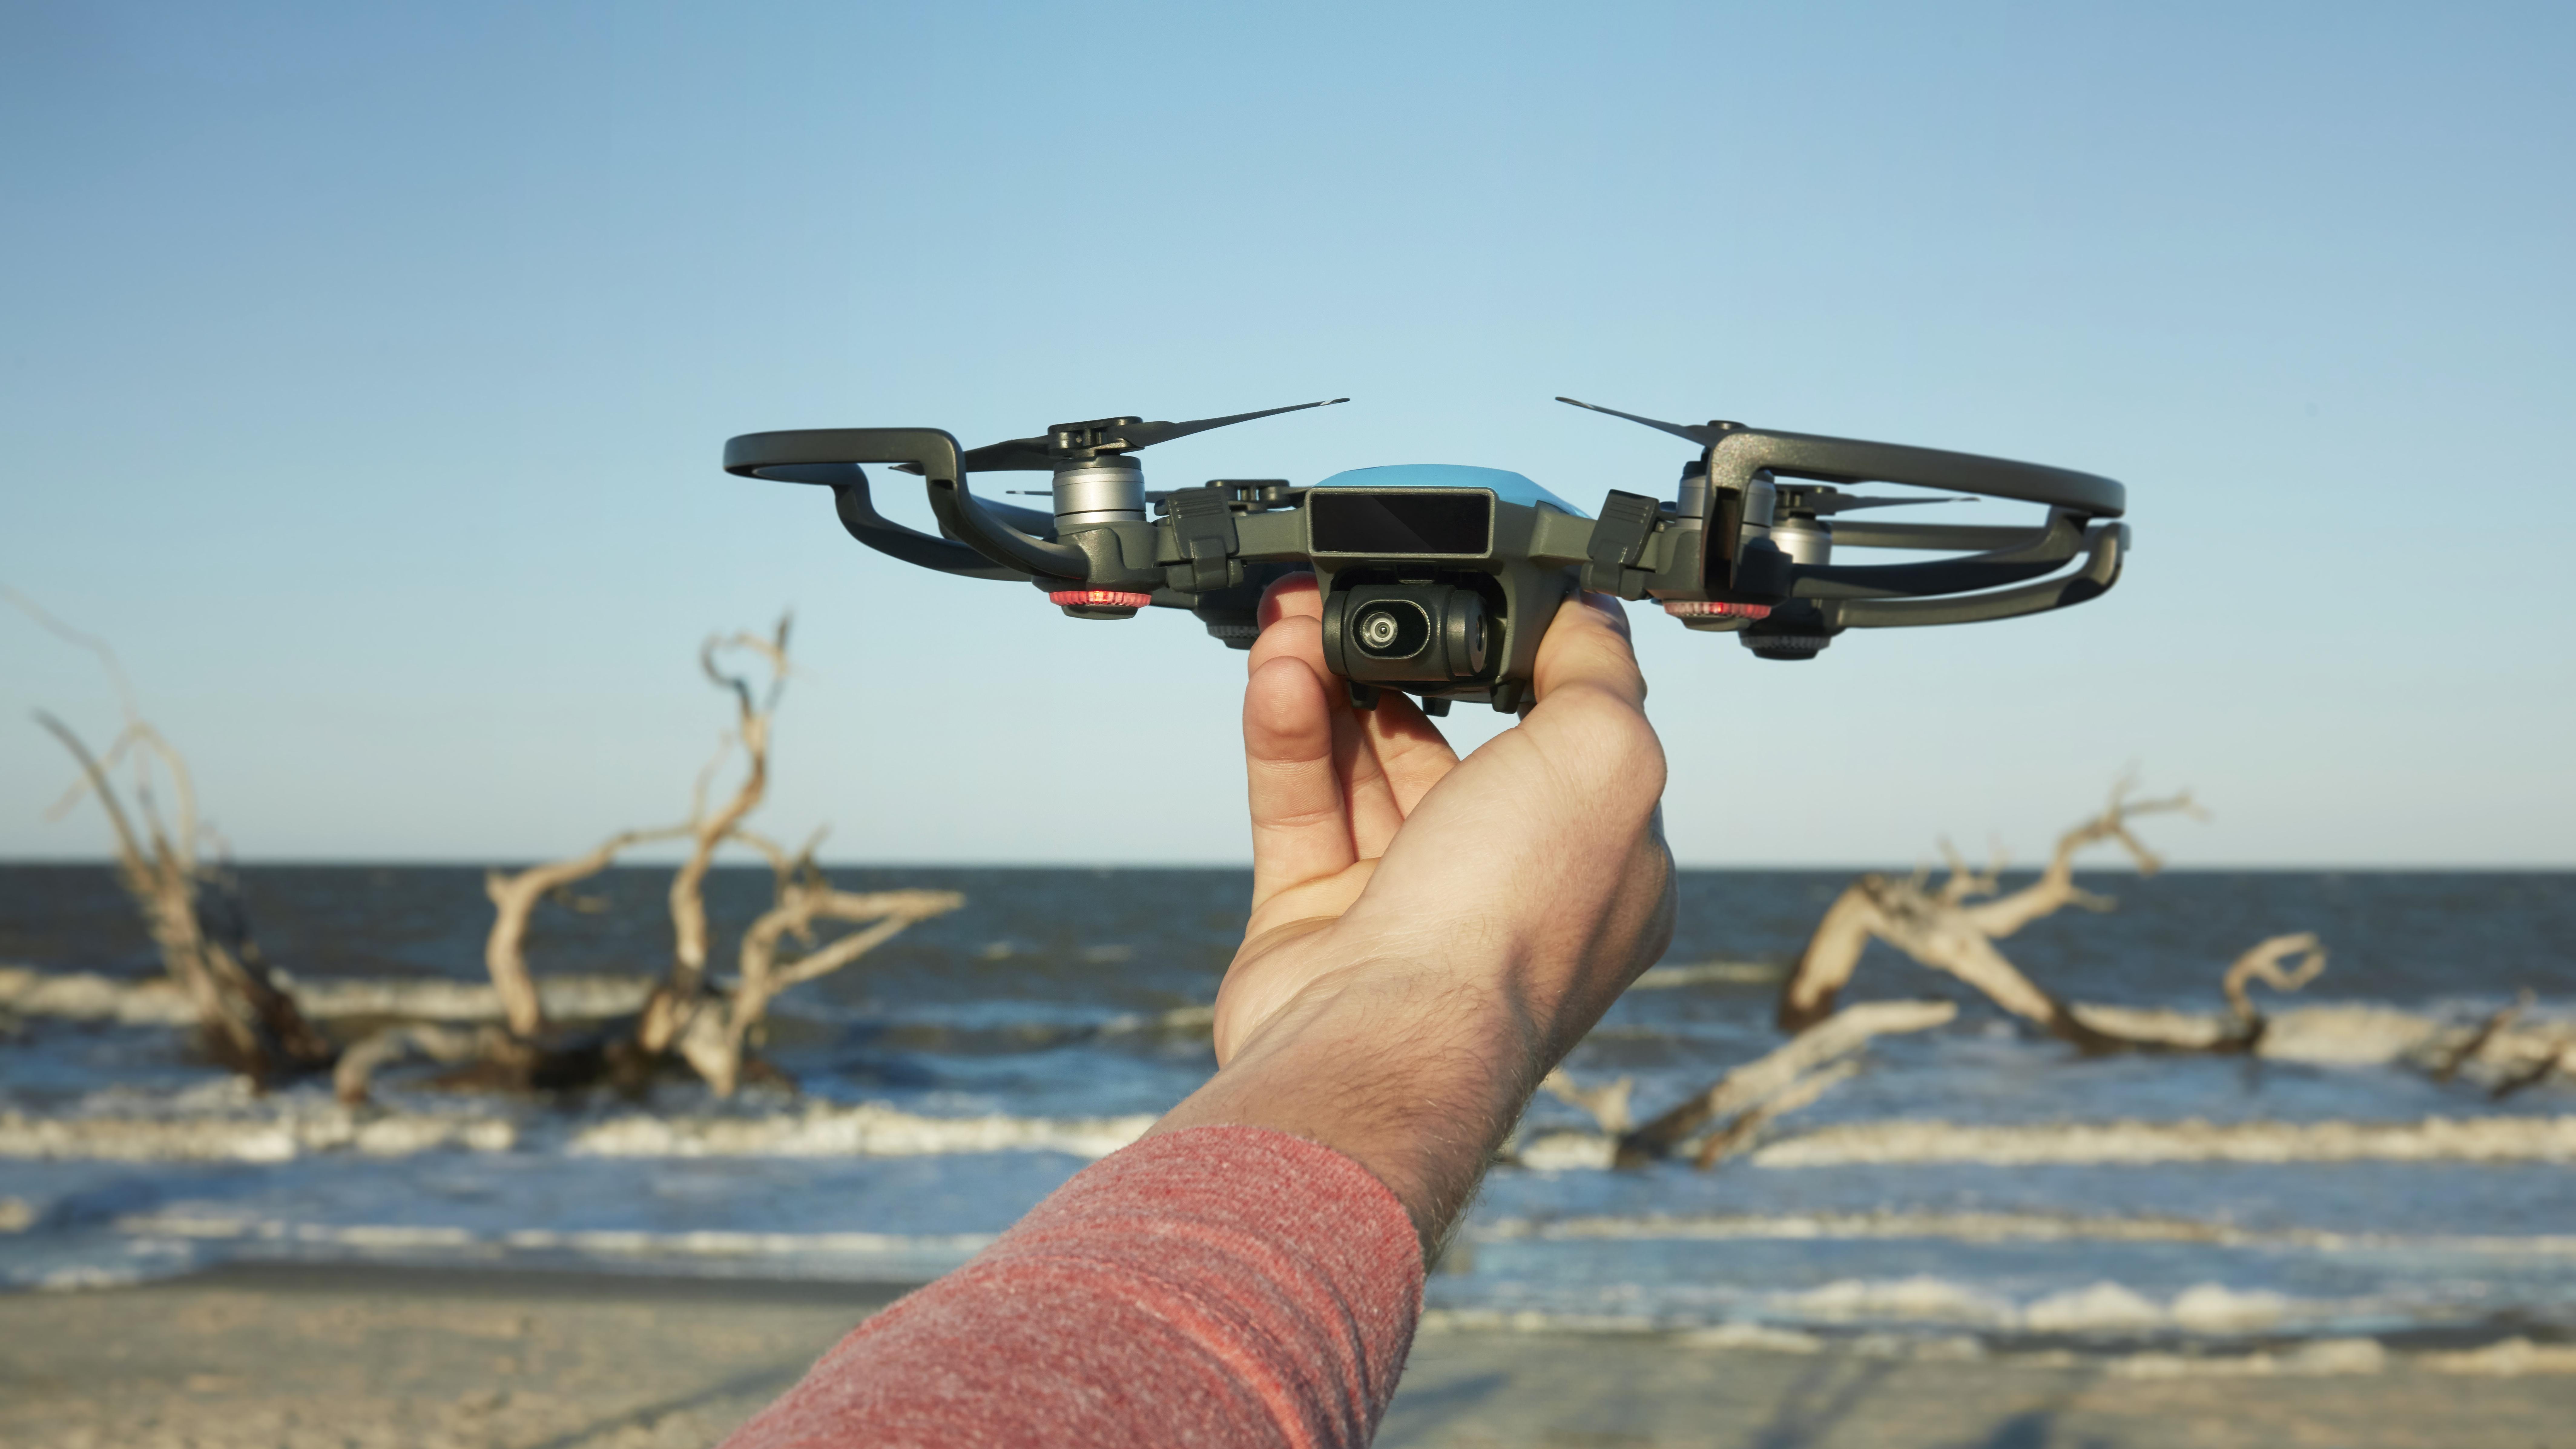 DJI Spark new drone